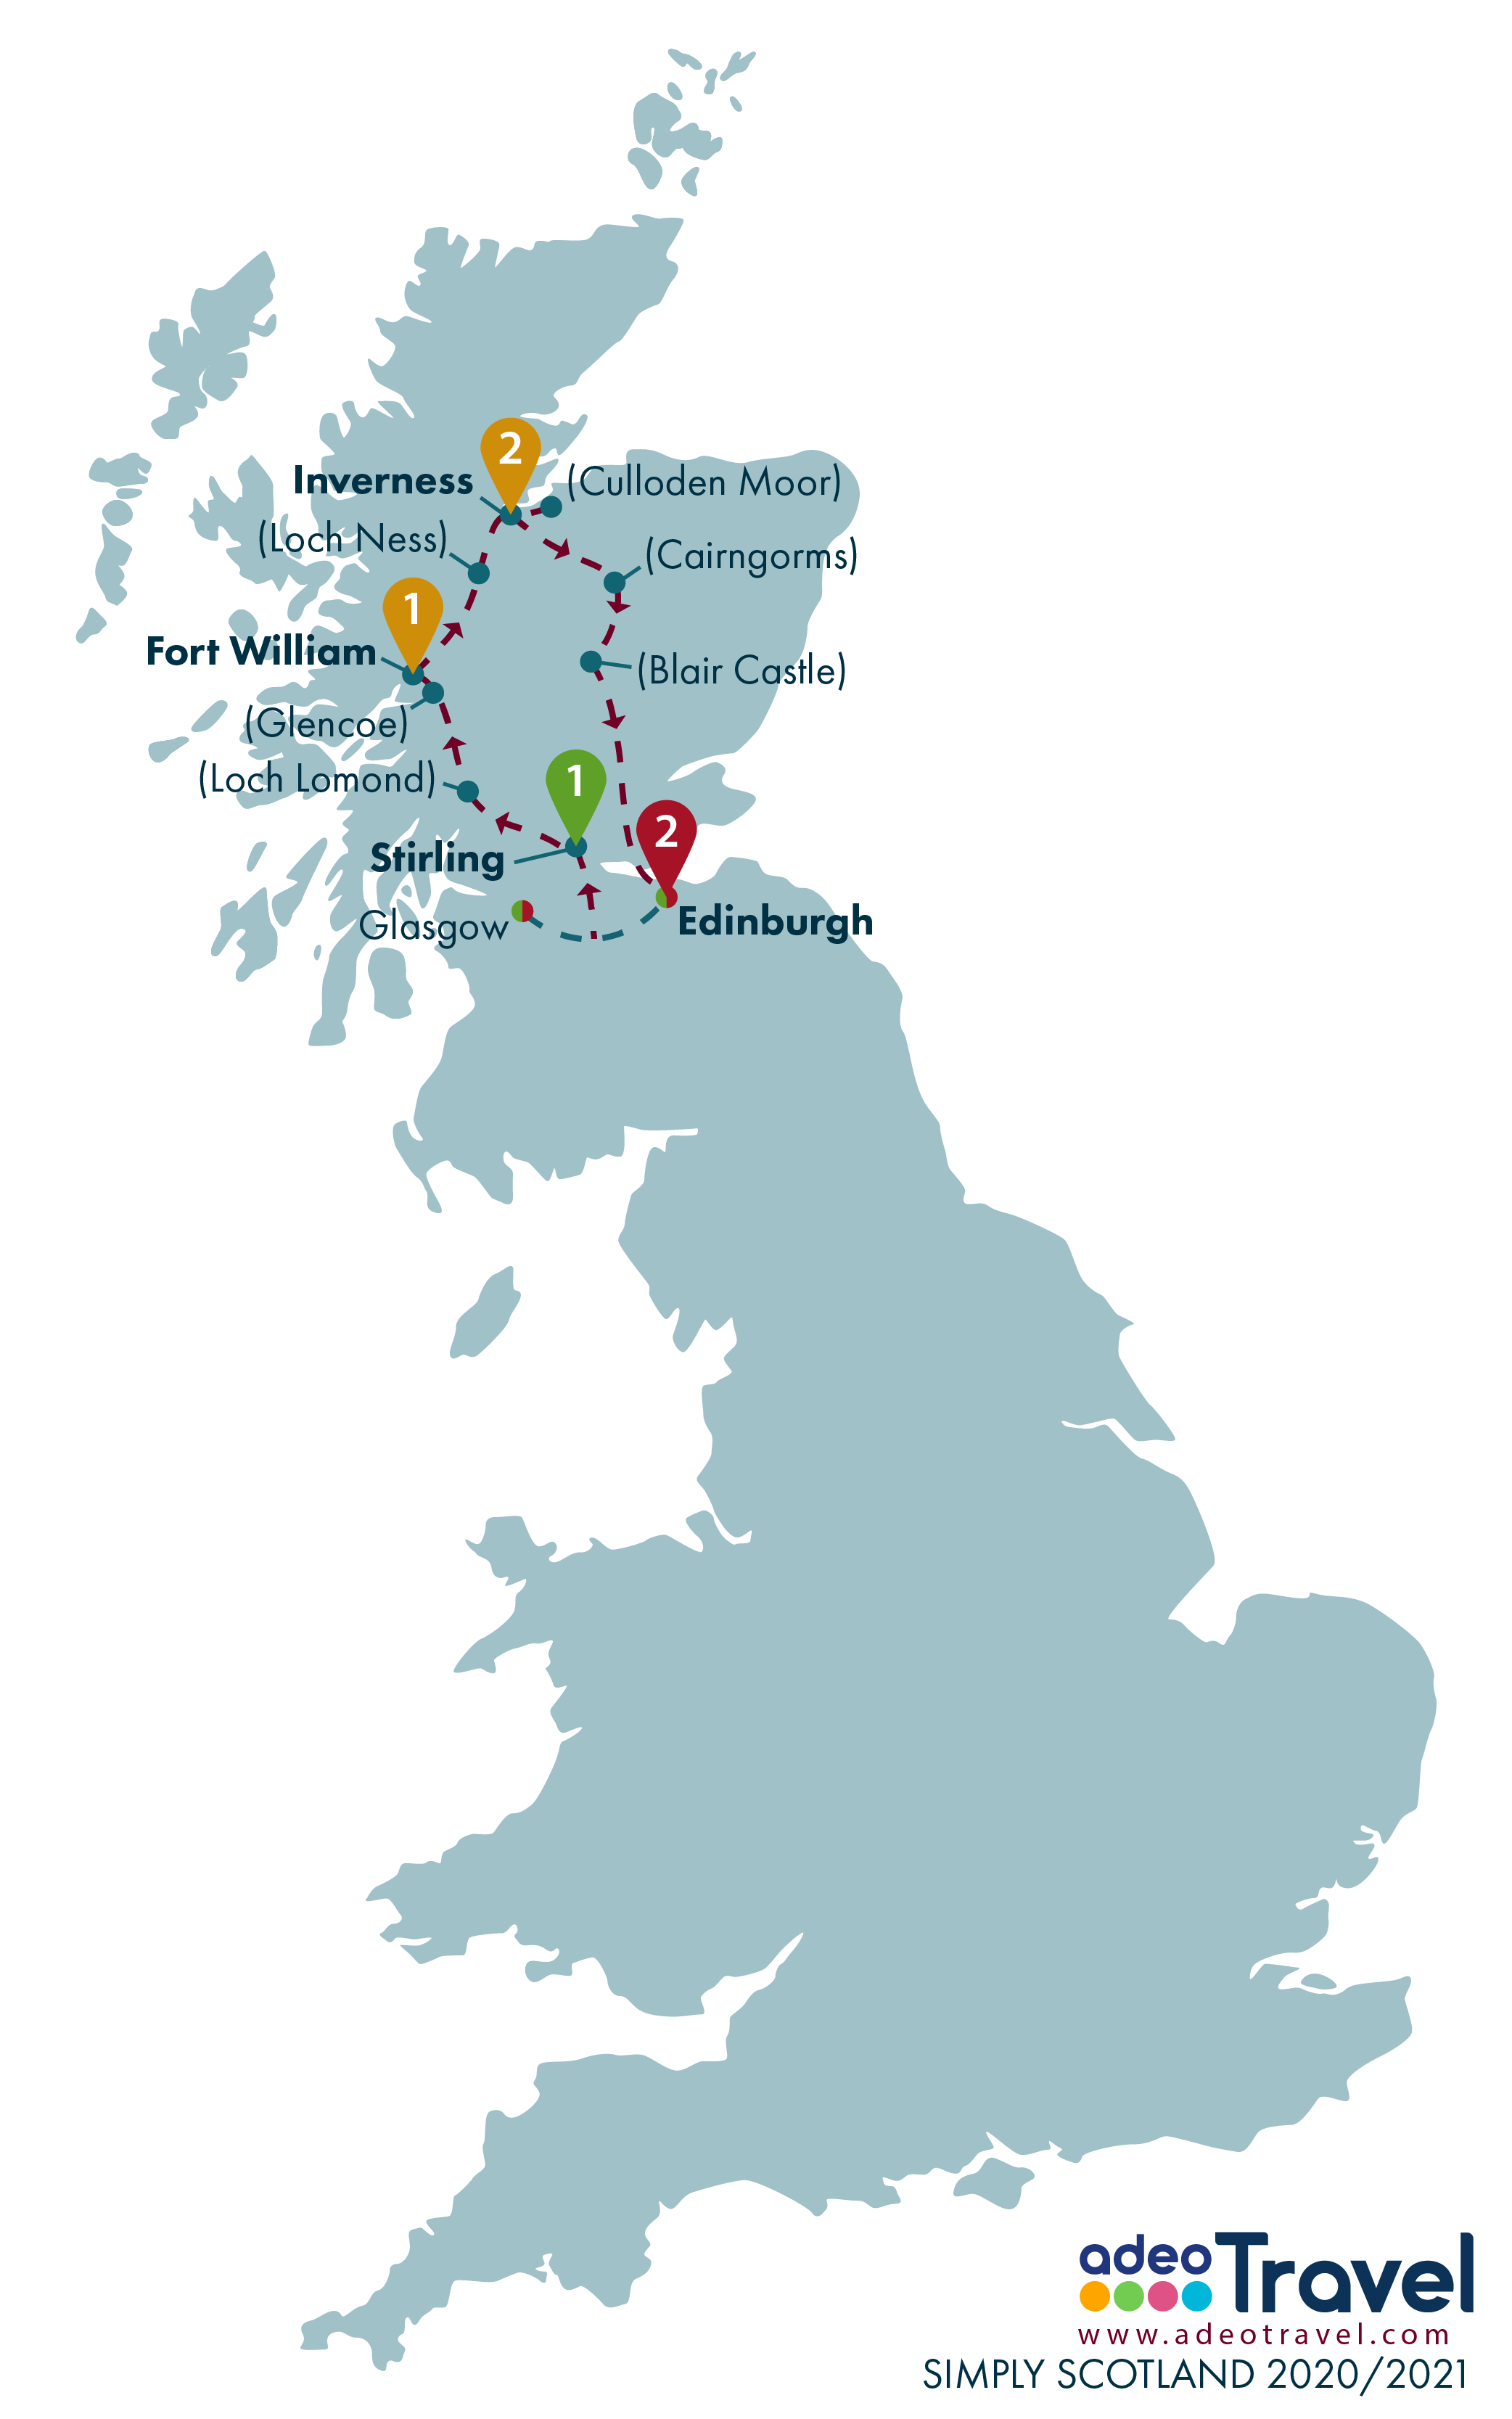 Map - Simply Scotland 2020 2021